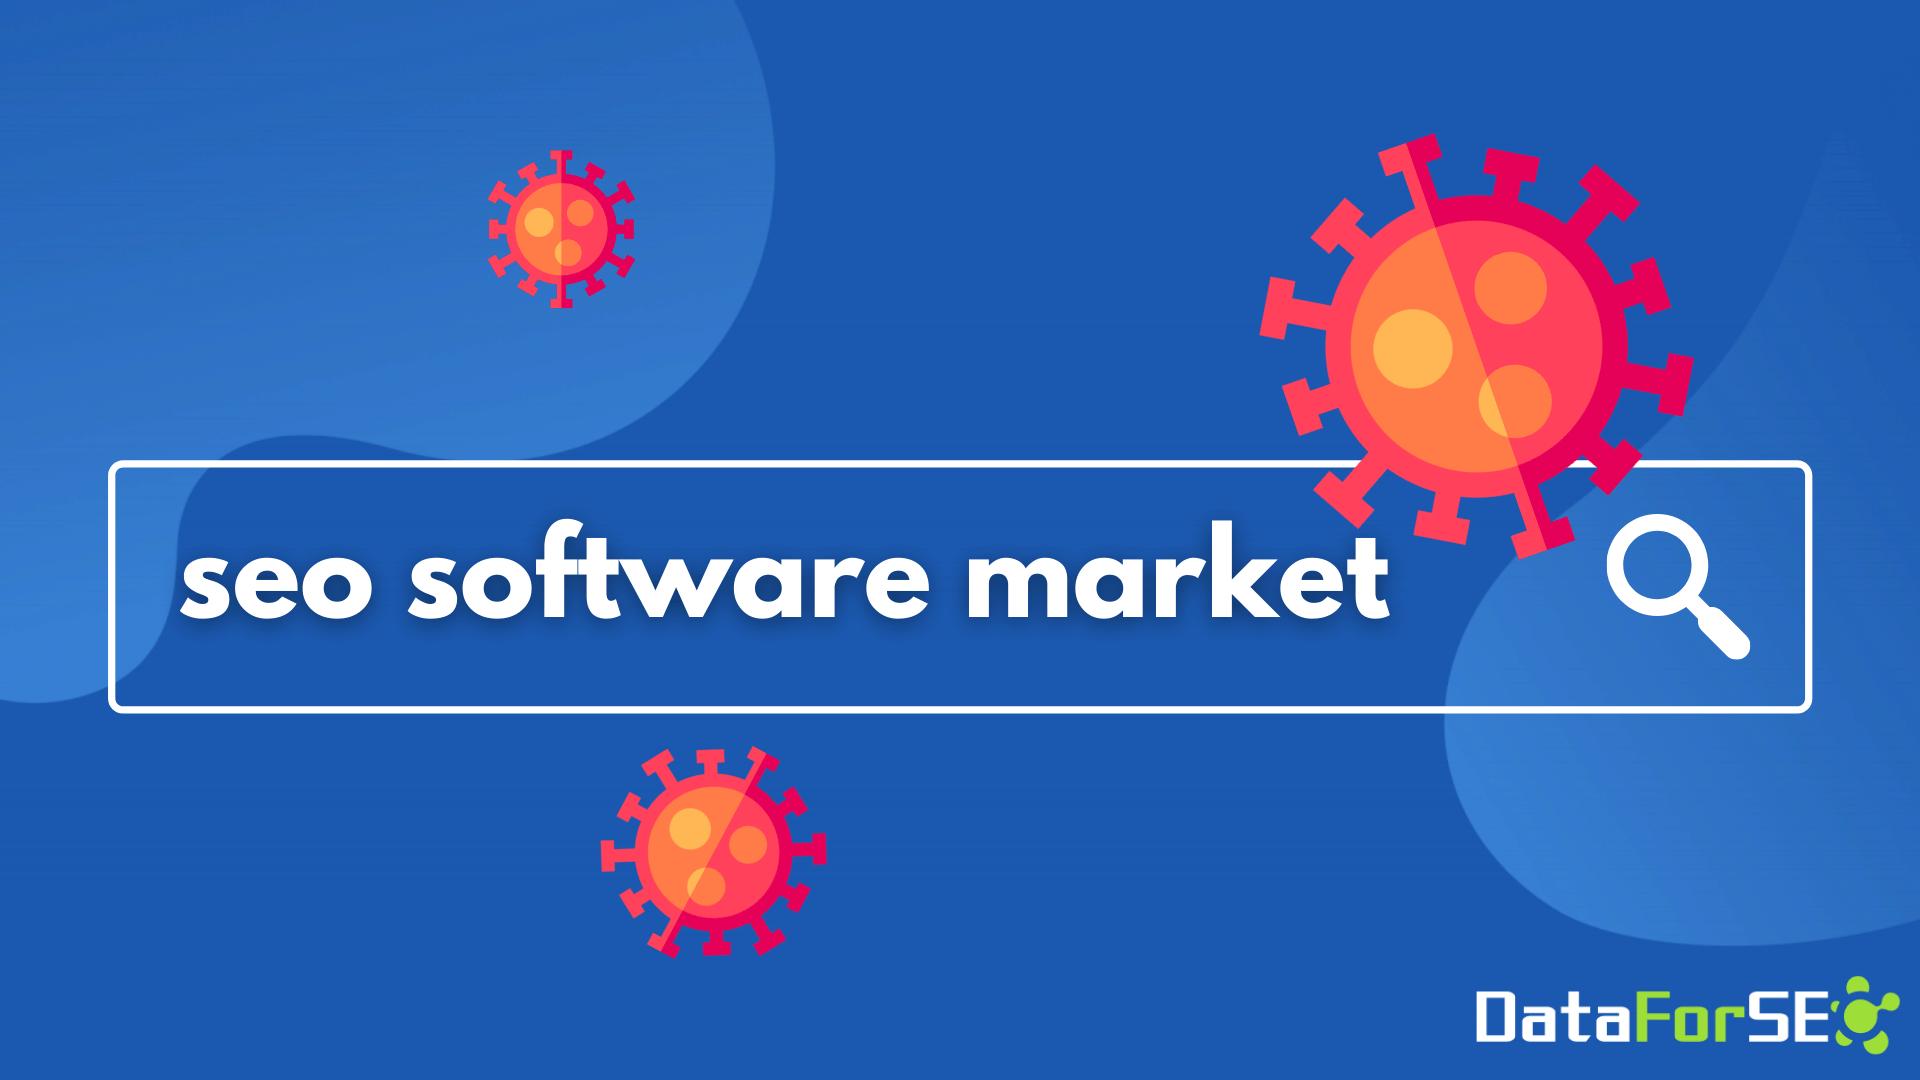 seo software market and covid-19